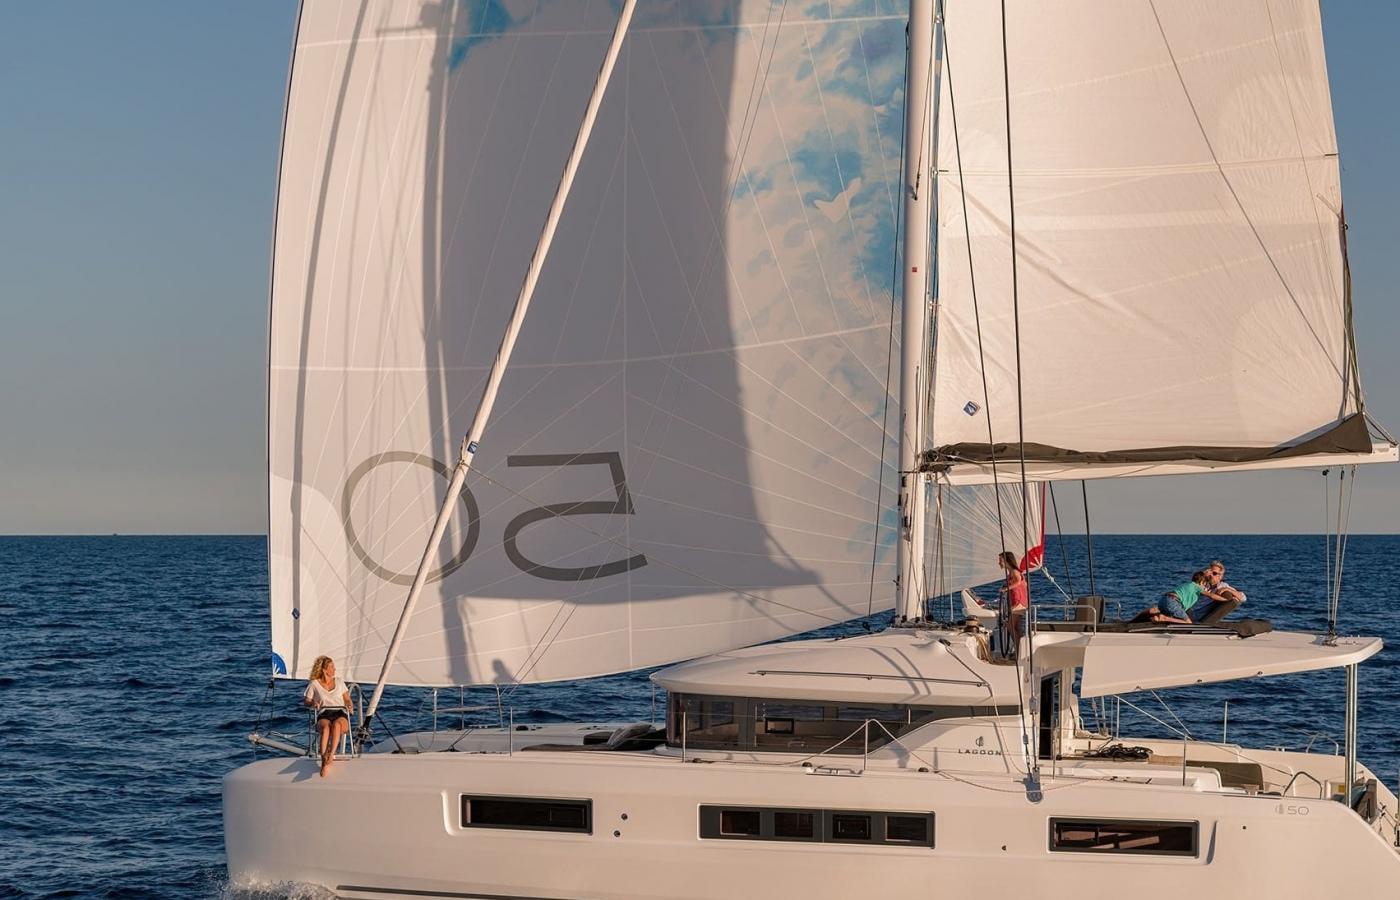 View of the main sails on board the Lagoon 50 - Ohana